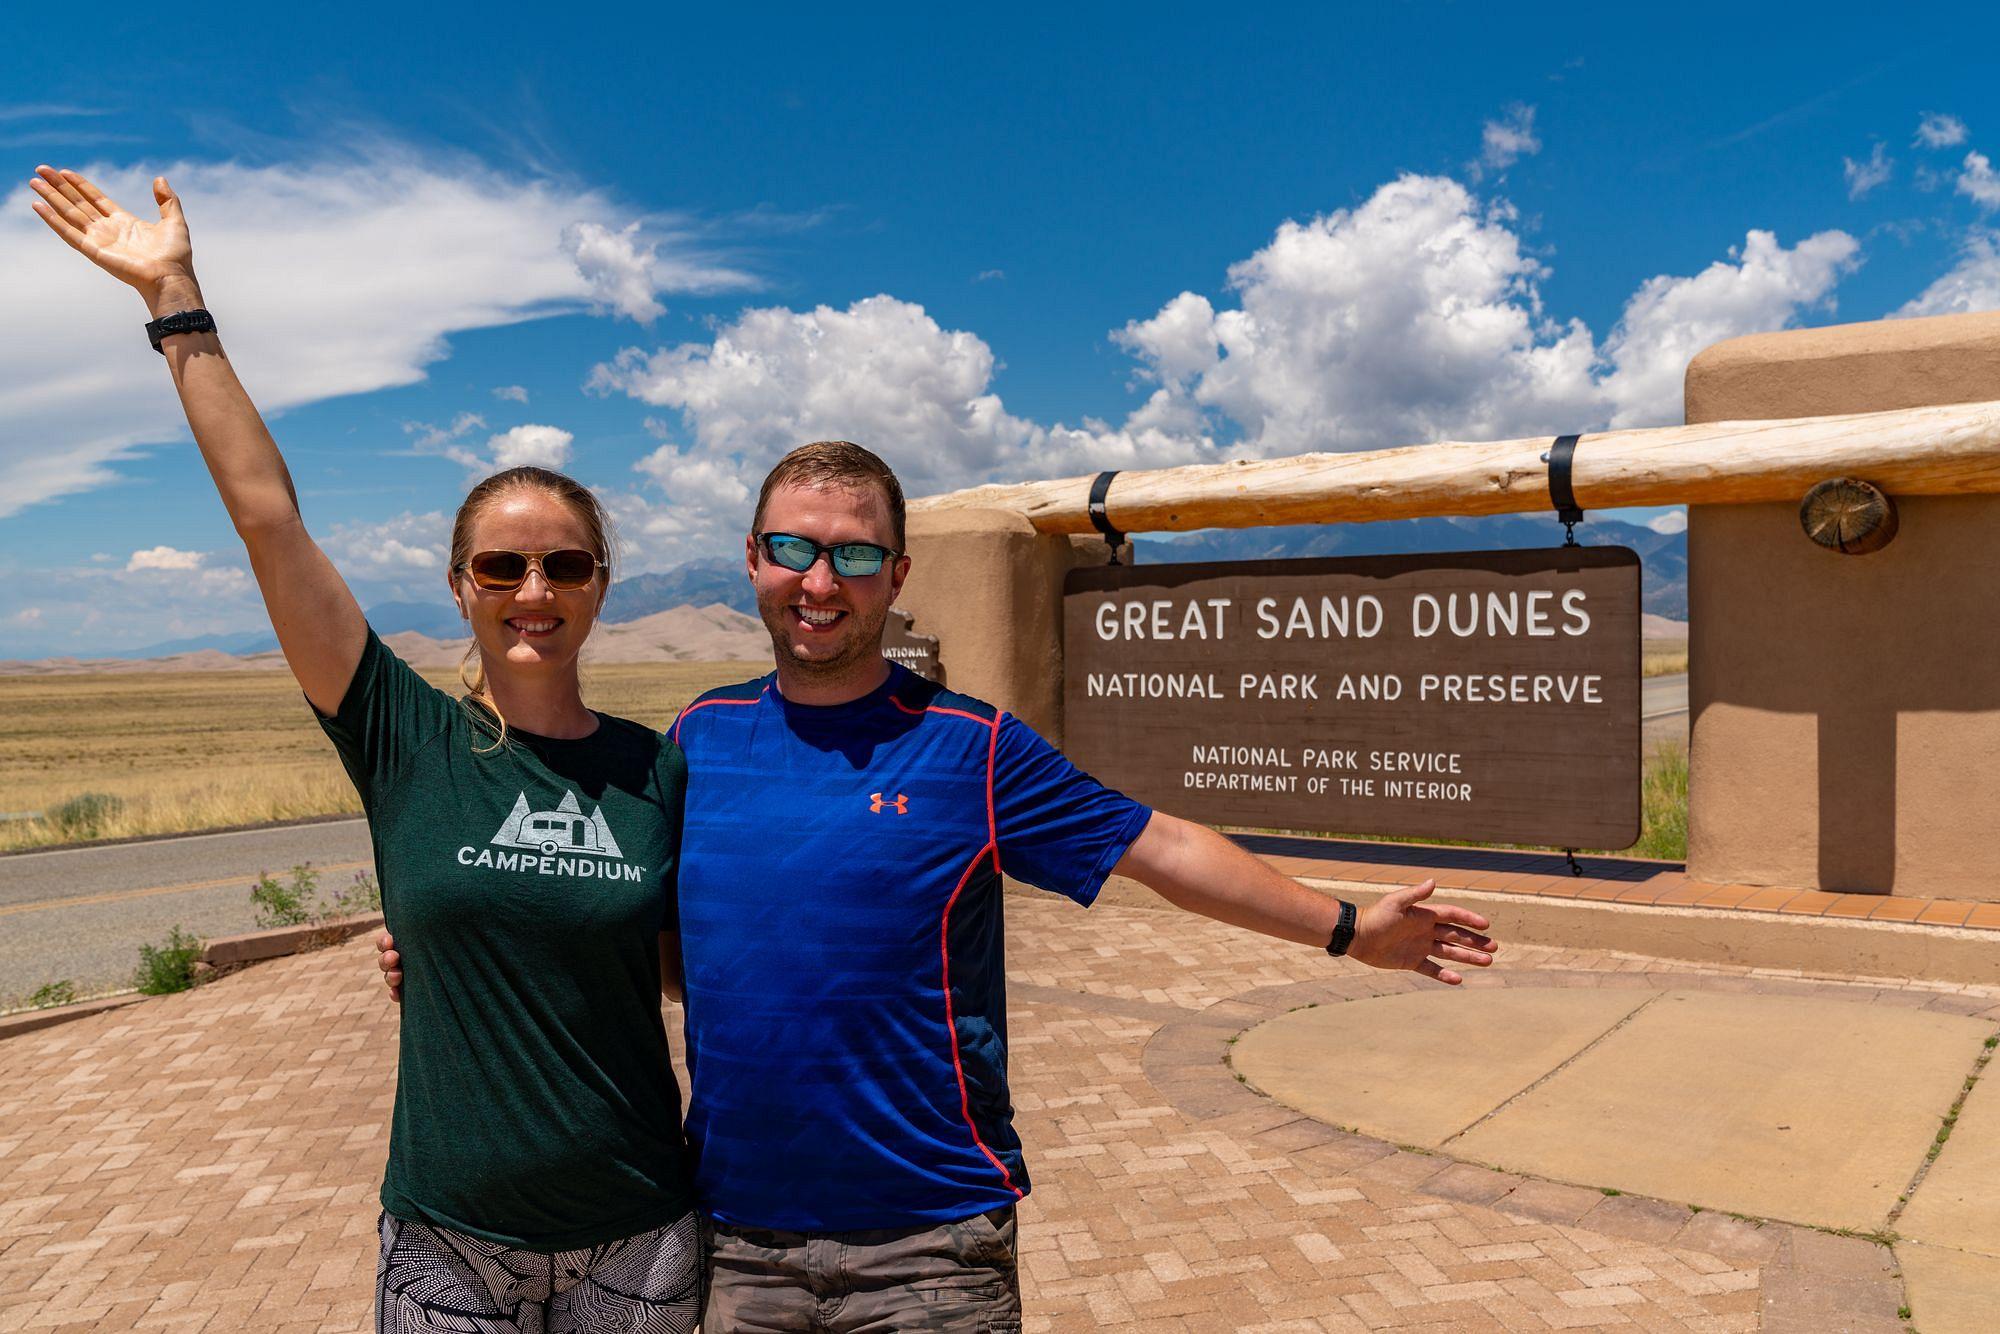 Great Sand Dunes Entrance Sign